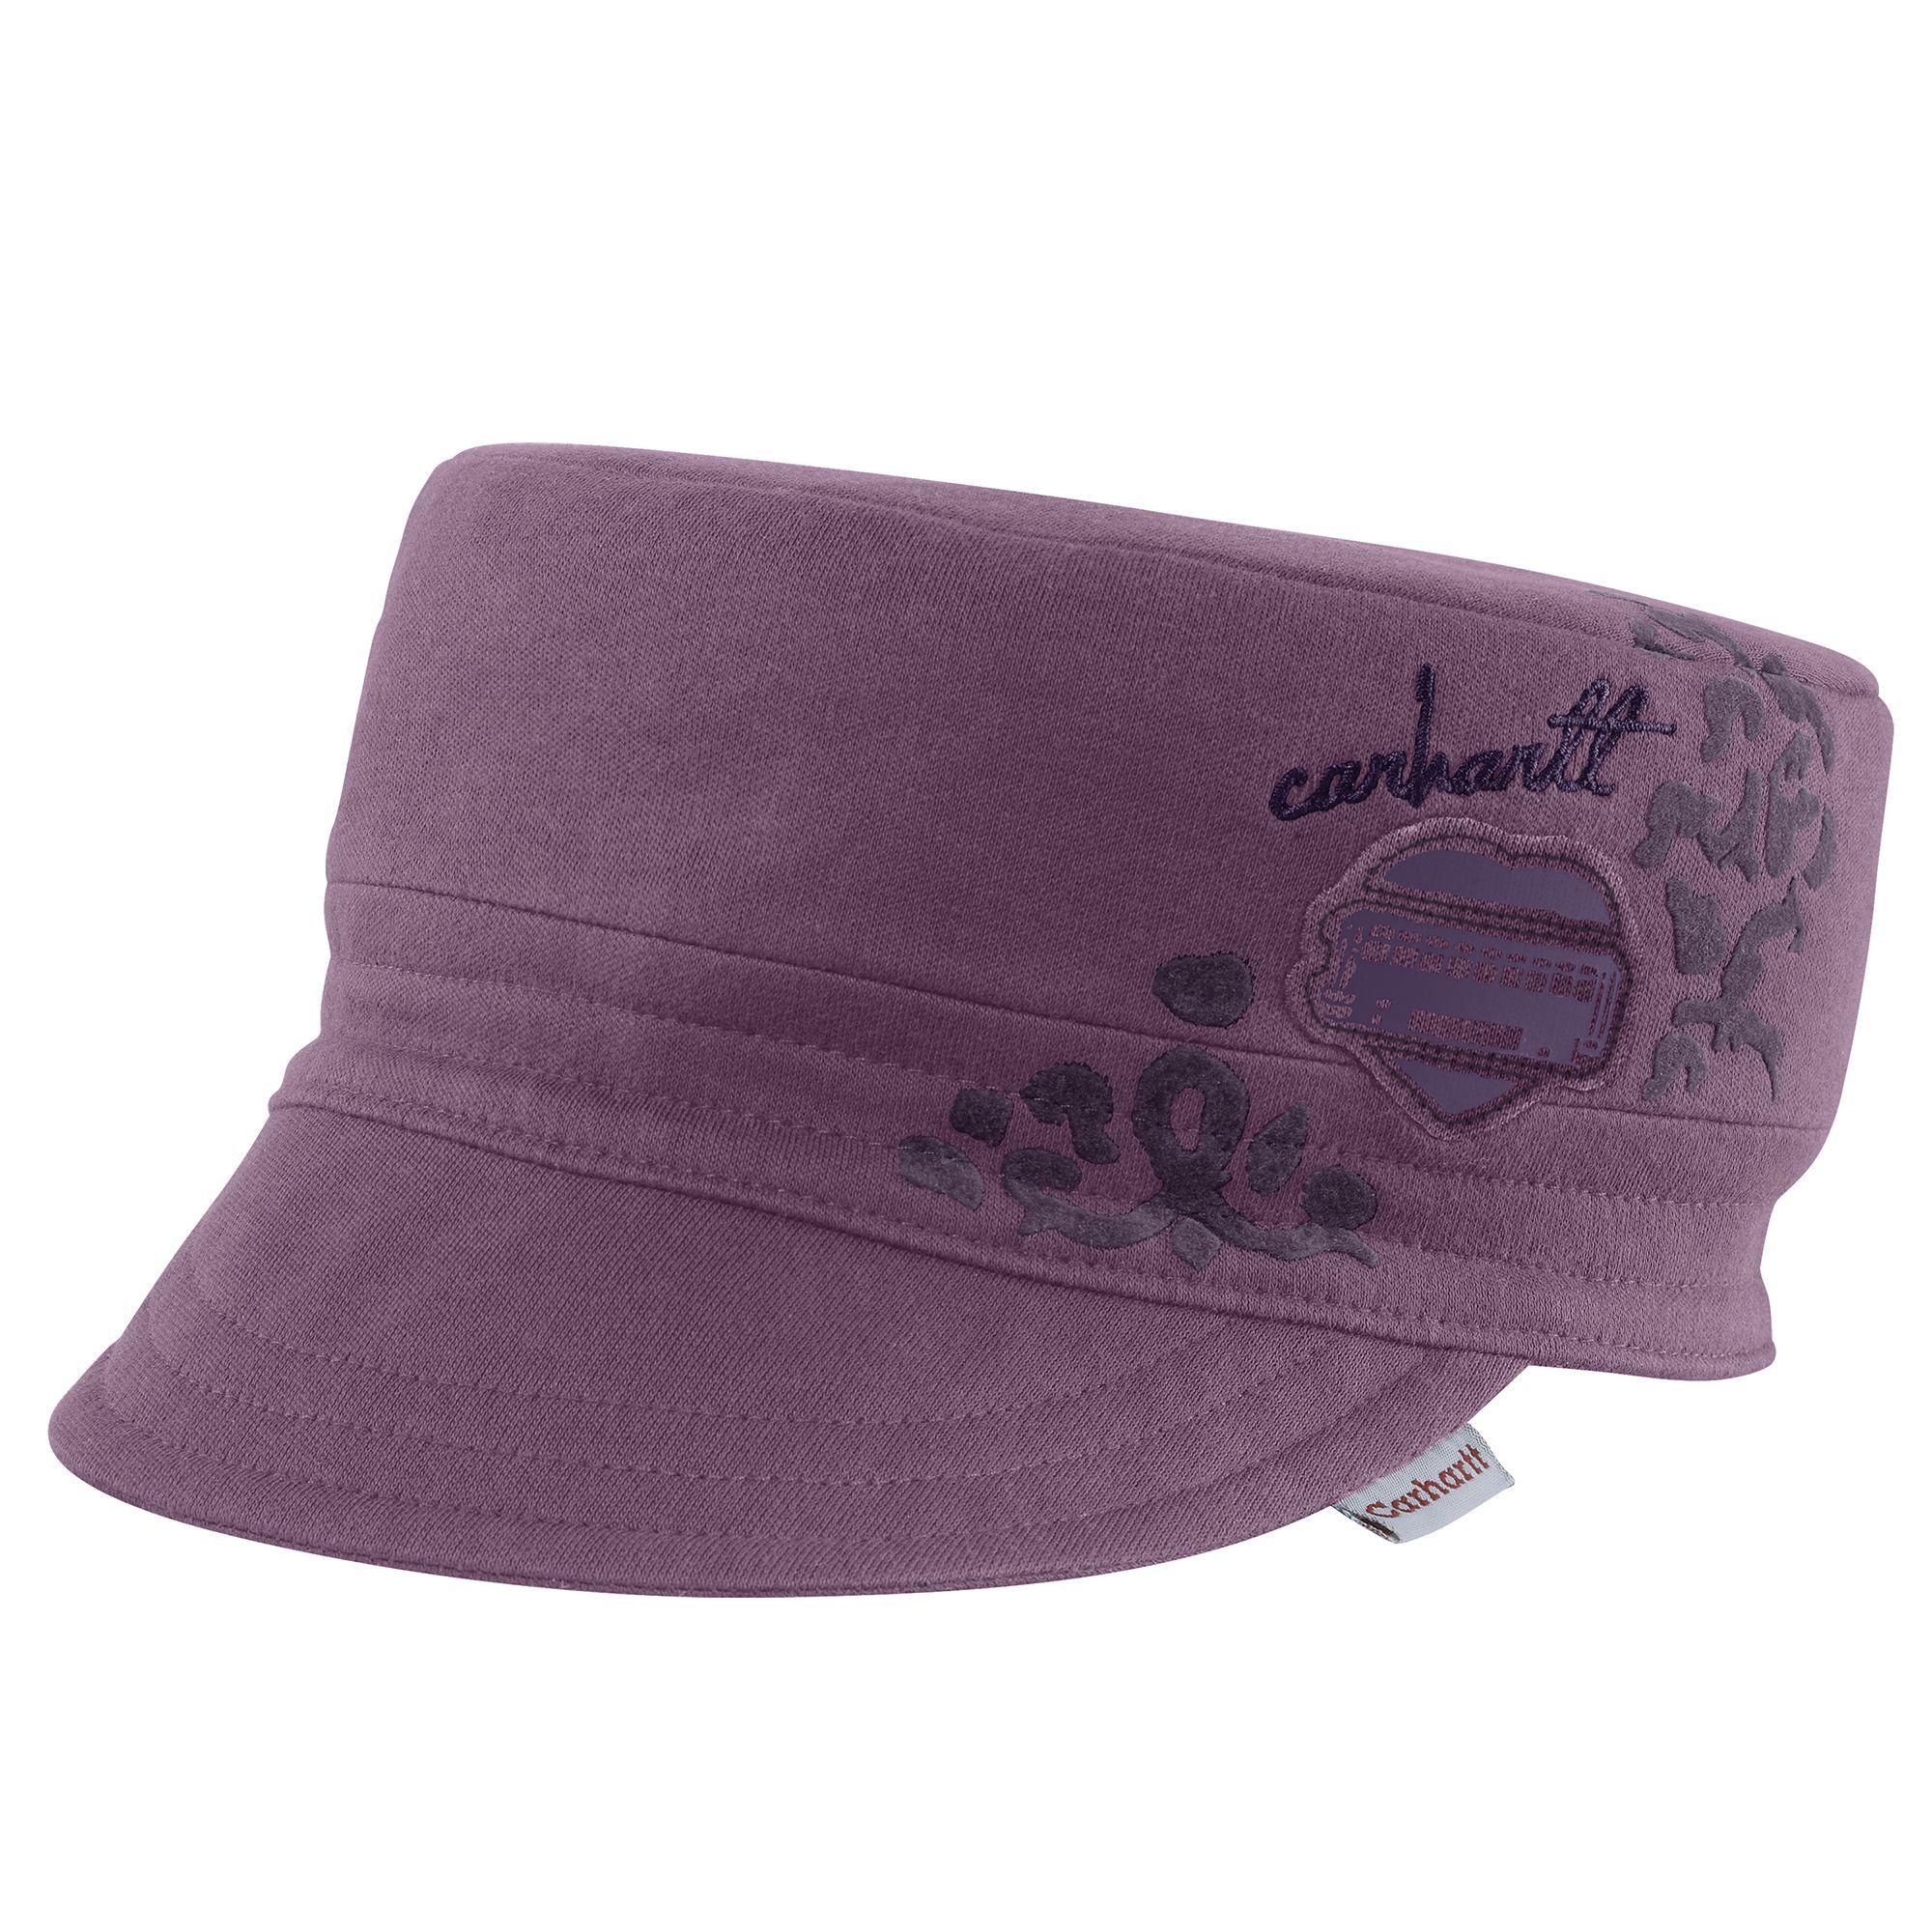 e344be0fb77 Carhartt WomensOsmore Conductor Cap 101114 Mulberry Purple